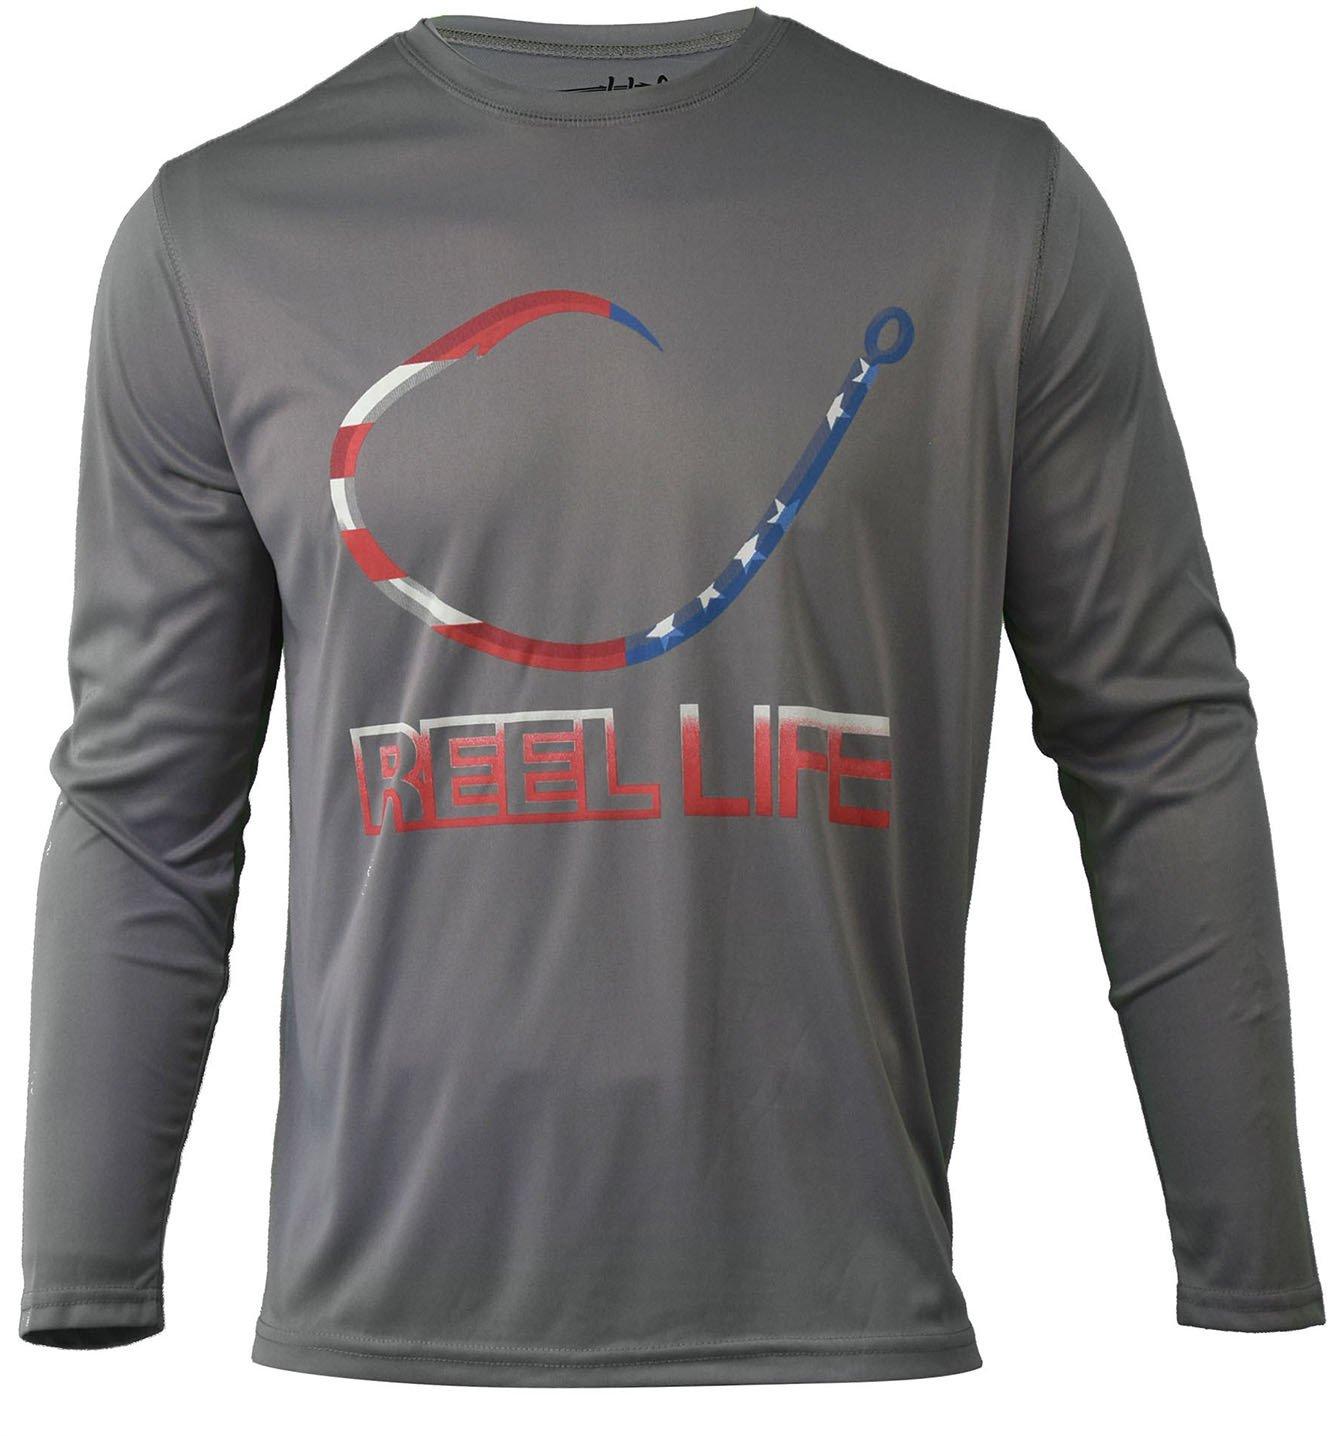 05a3998c Reel Life Men's Freedom Circle Hook Performance UV Fishing Shirt | Academy